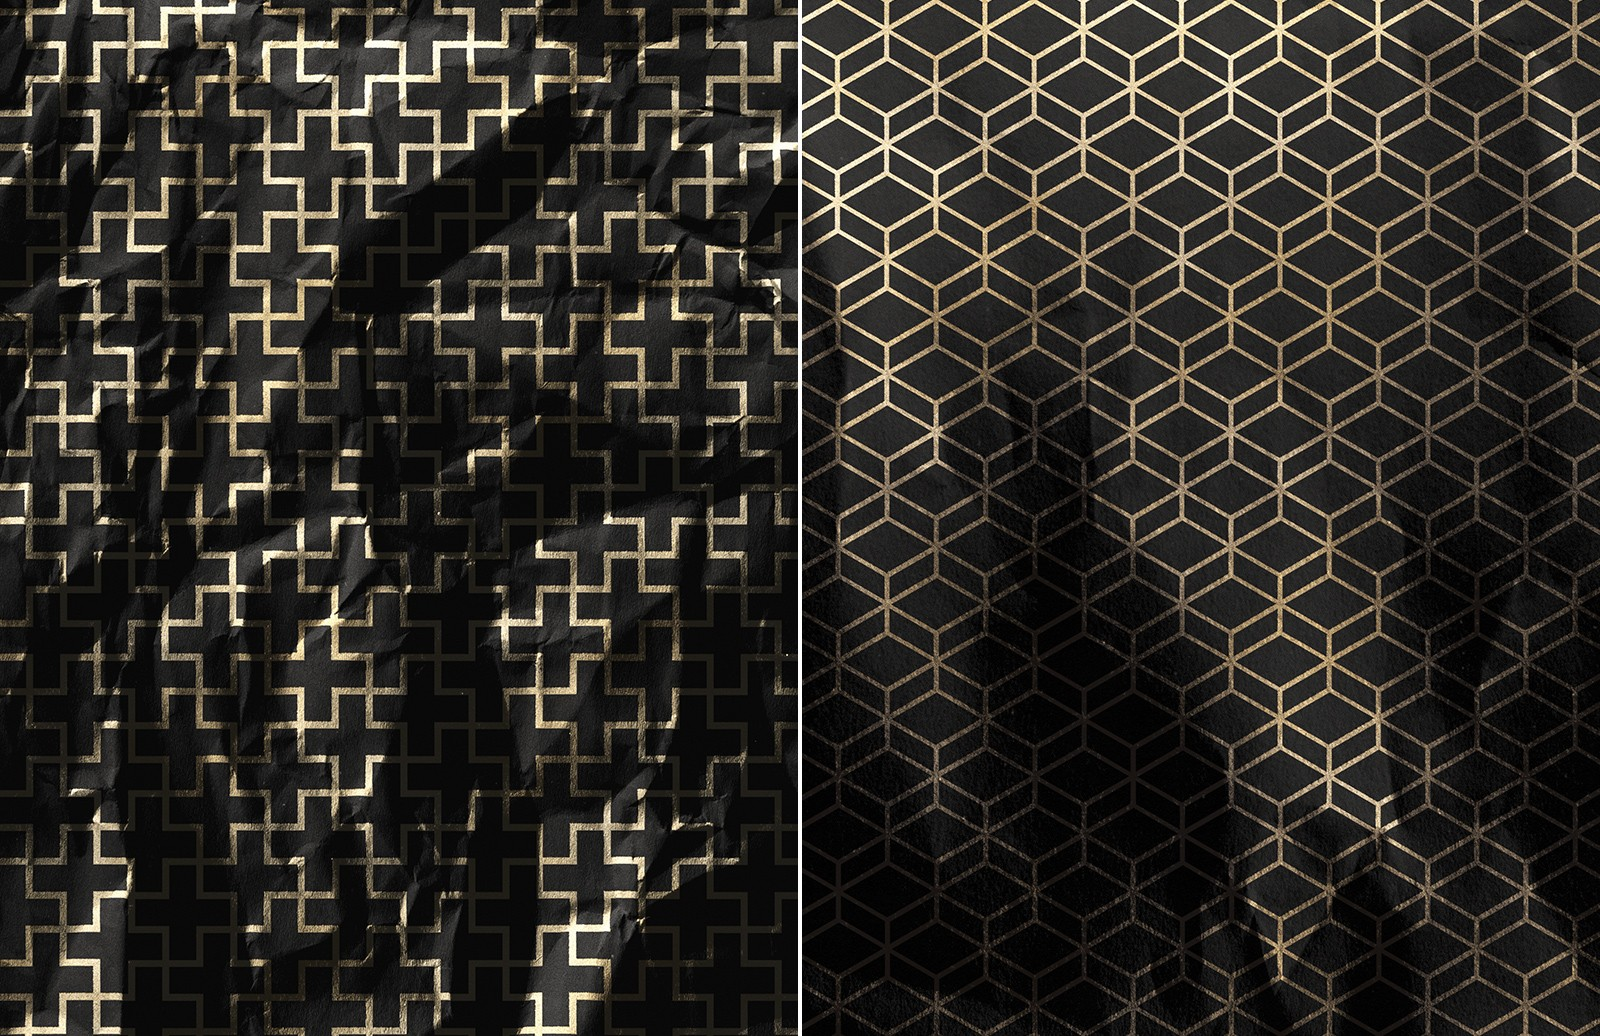 Gold  Foil  Paper  Textures  Preview 5